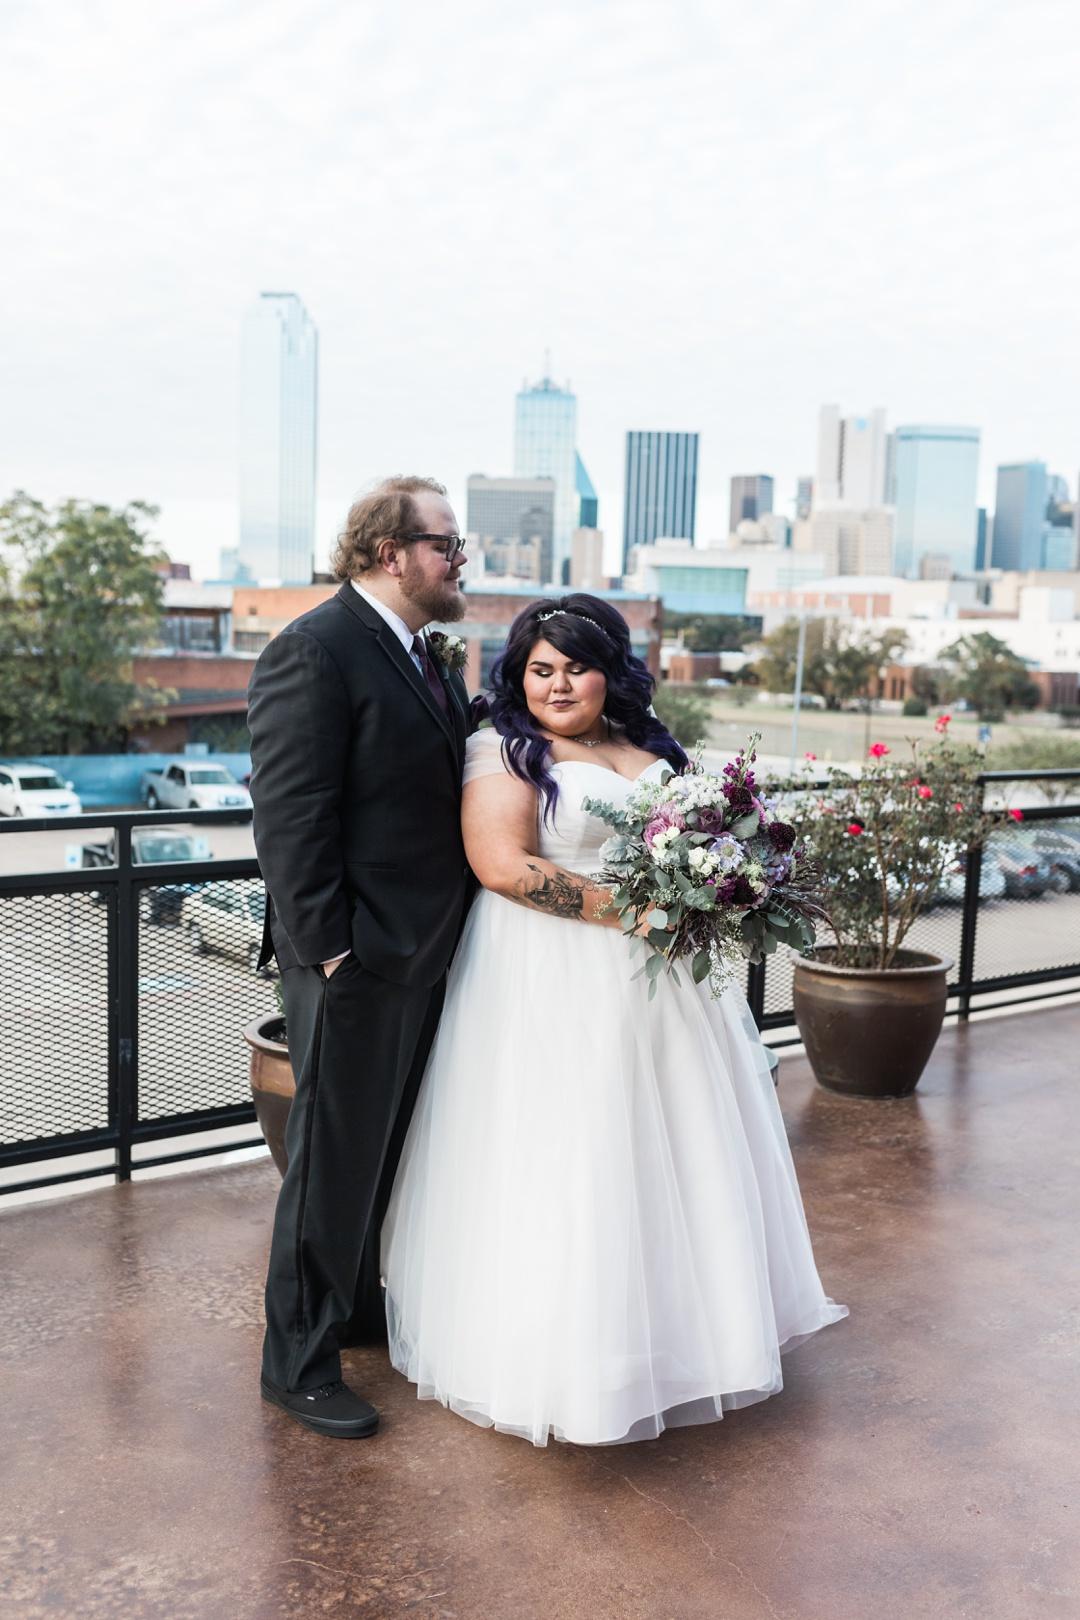 gilleys_dallas_wedding-35-2